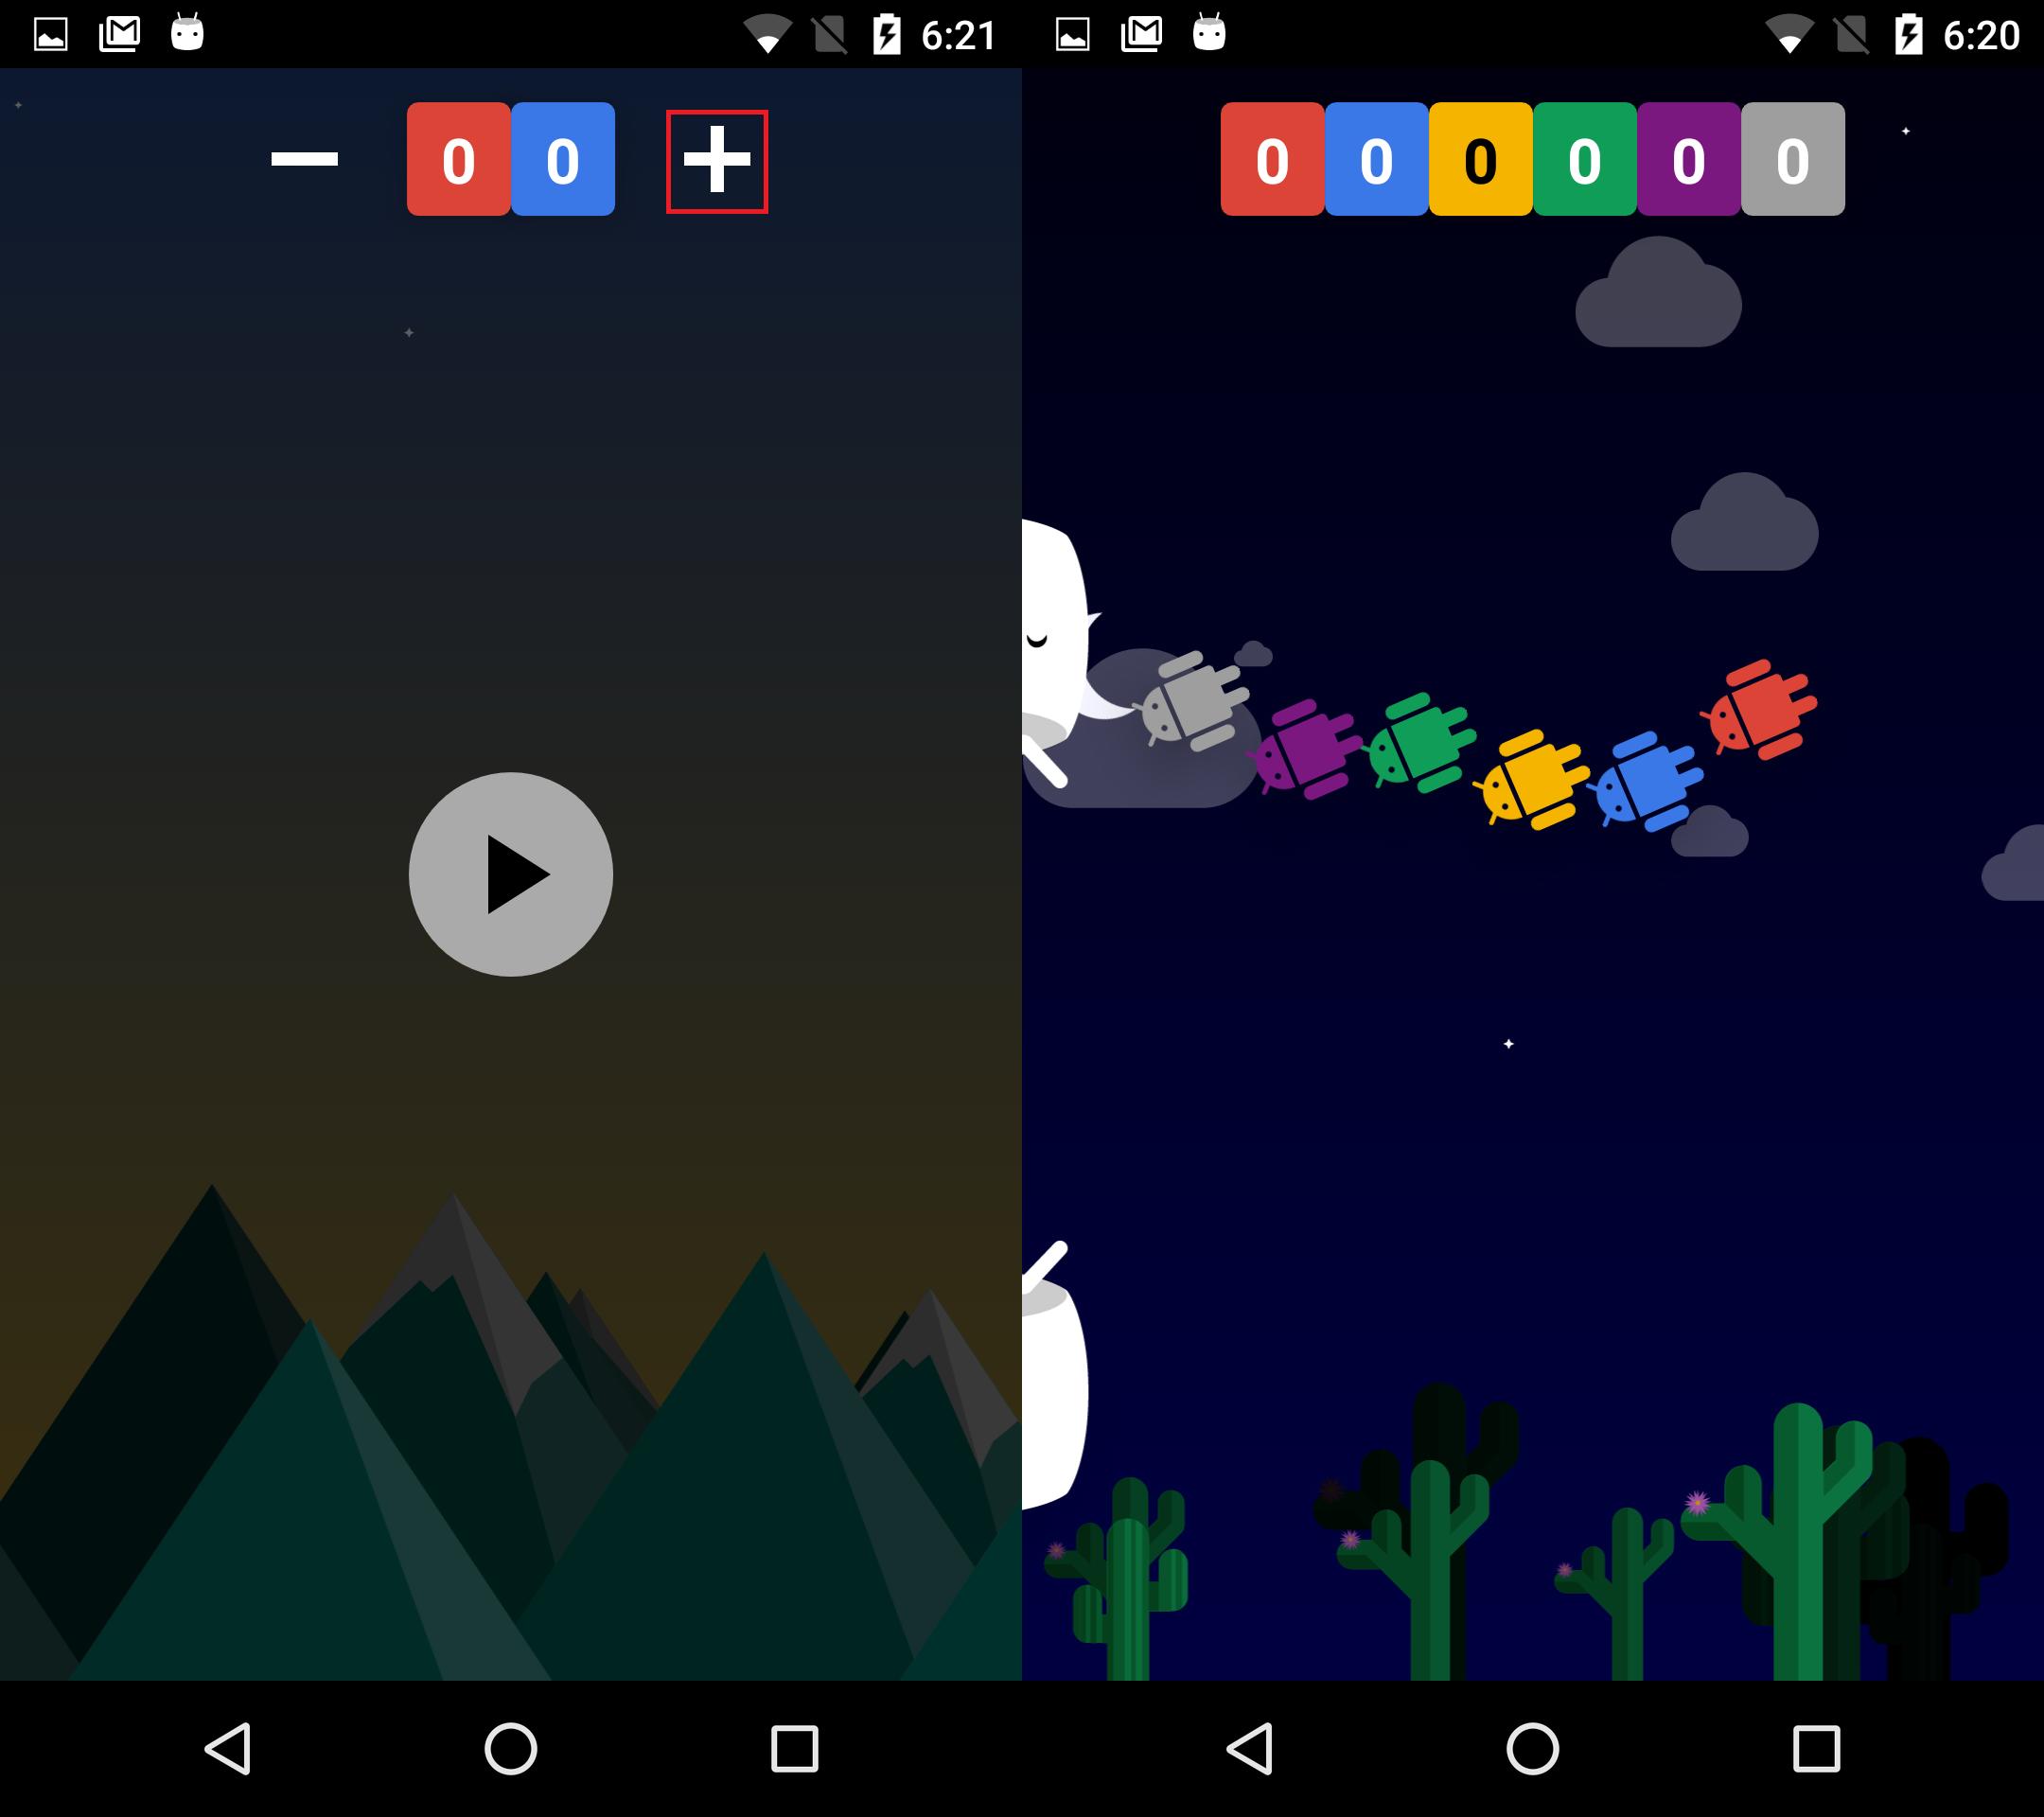 Android 6.0のイースターエッグ。Flappy bird風のゲームが復活